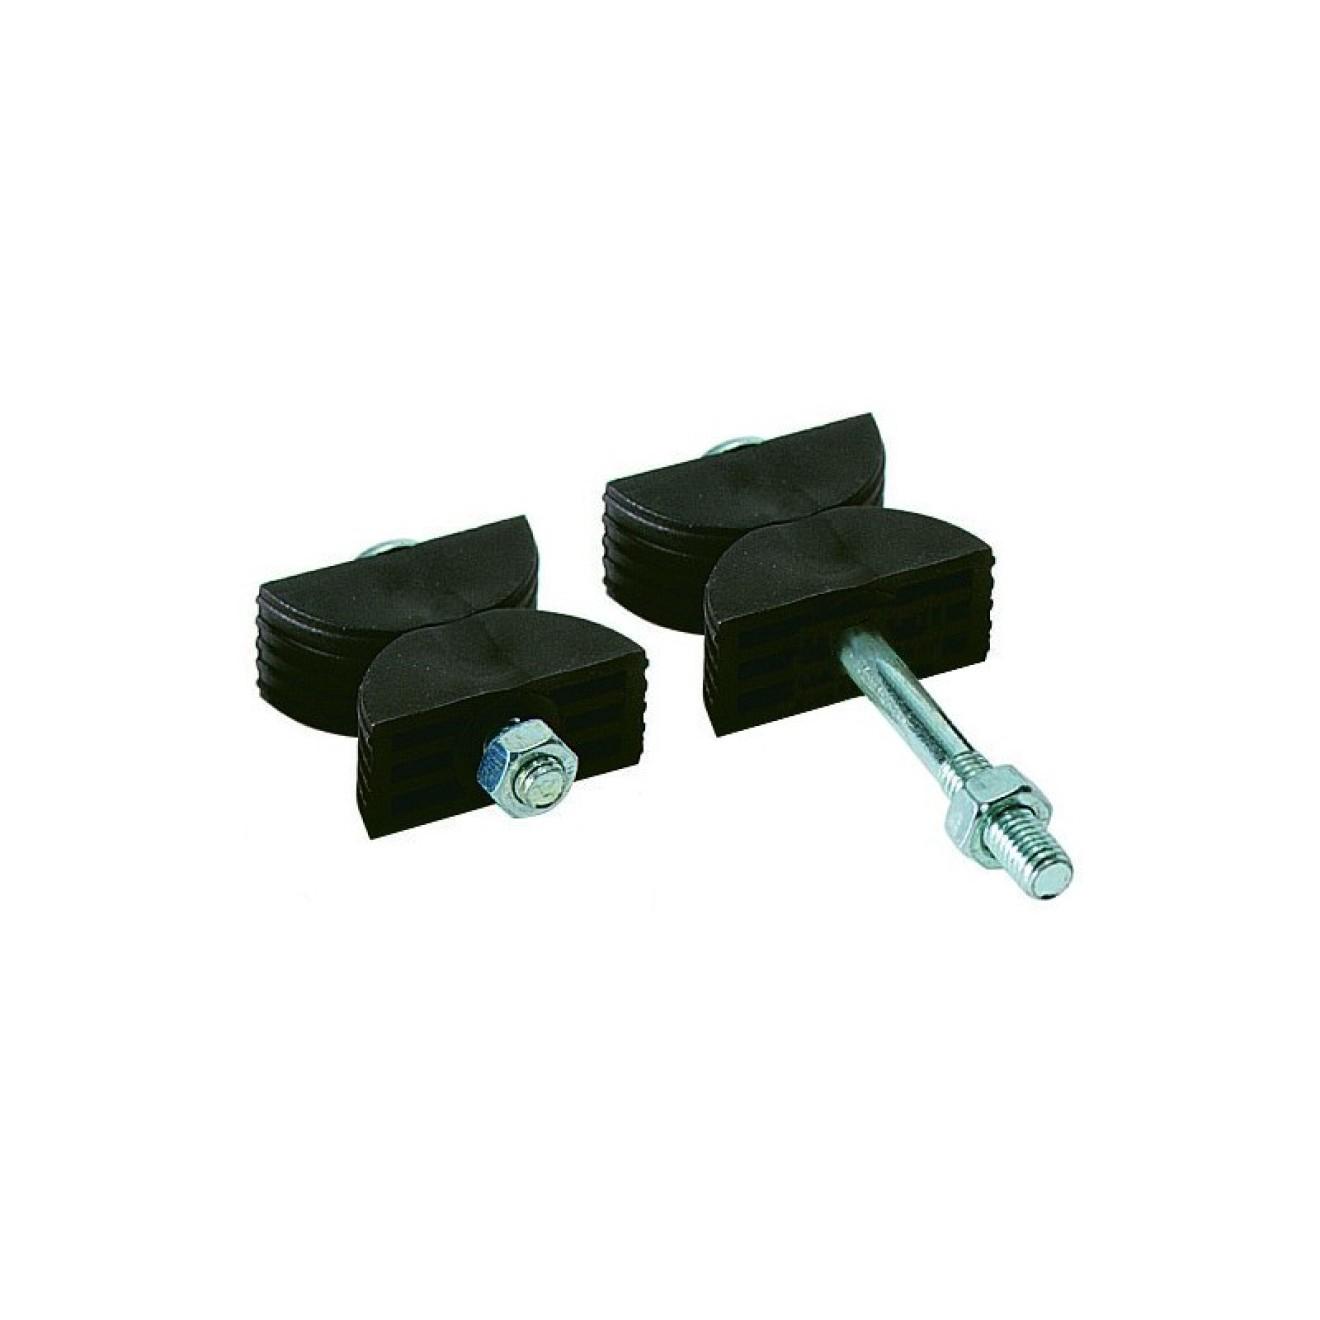 arbeitsplatten verbinder m 6 schraubenl nge 75 mm ve 1 ForVerbinder Arbeitsplatte